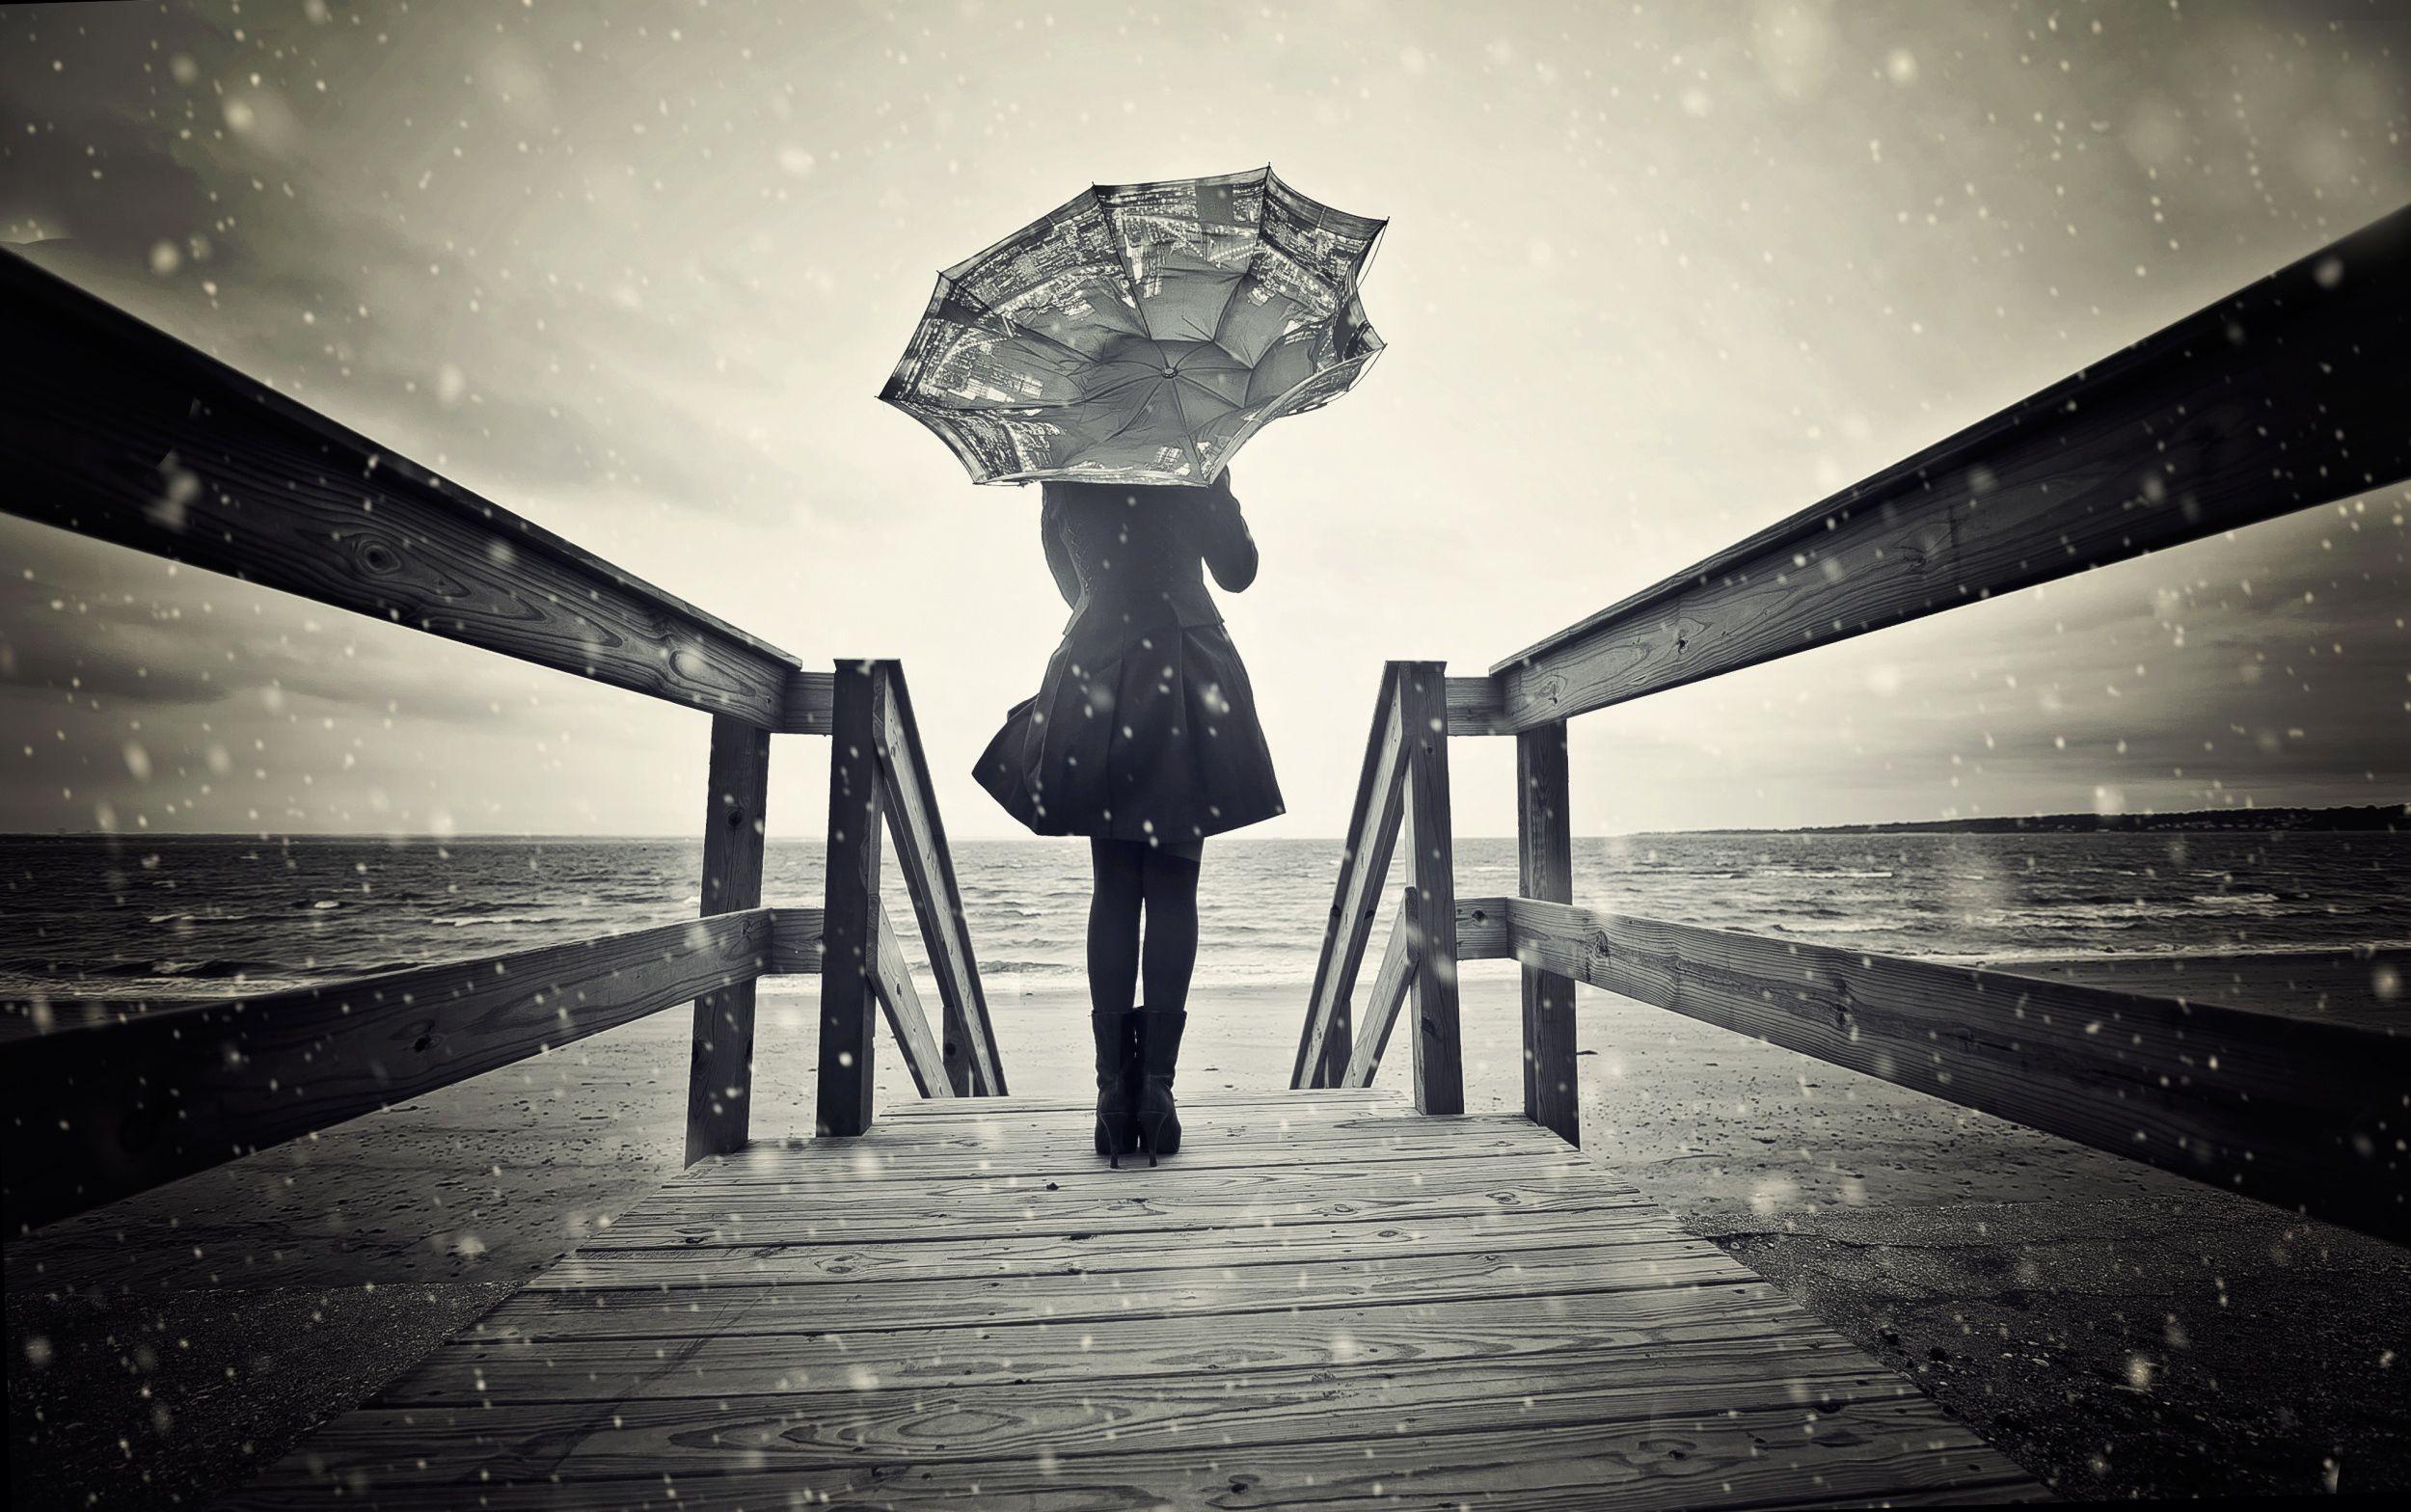 Sad Rain Wallpaper 1080p Kqk Earth In 2019 Pinterest Rain